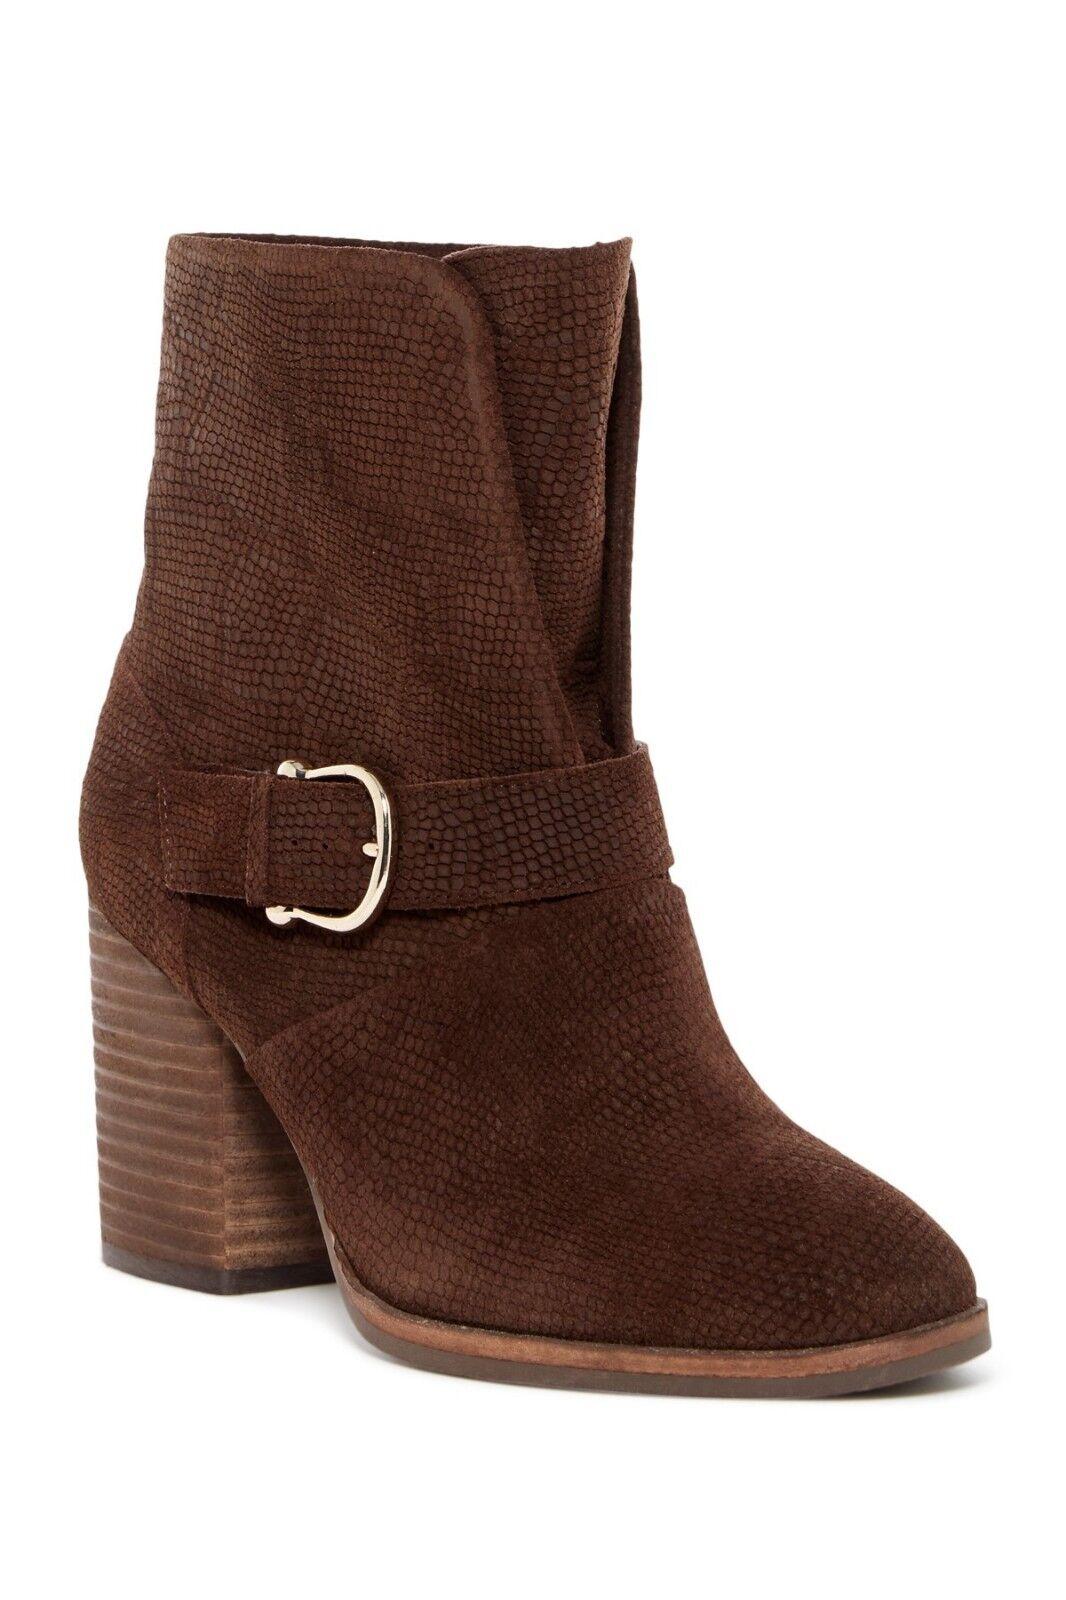 New  Isola Lavoy Block Heel Boot  Coffe  Suede  Damens's boots Größe 9